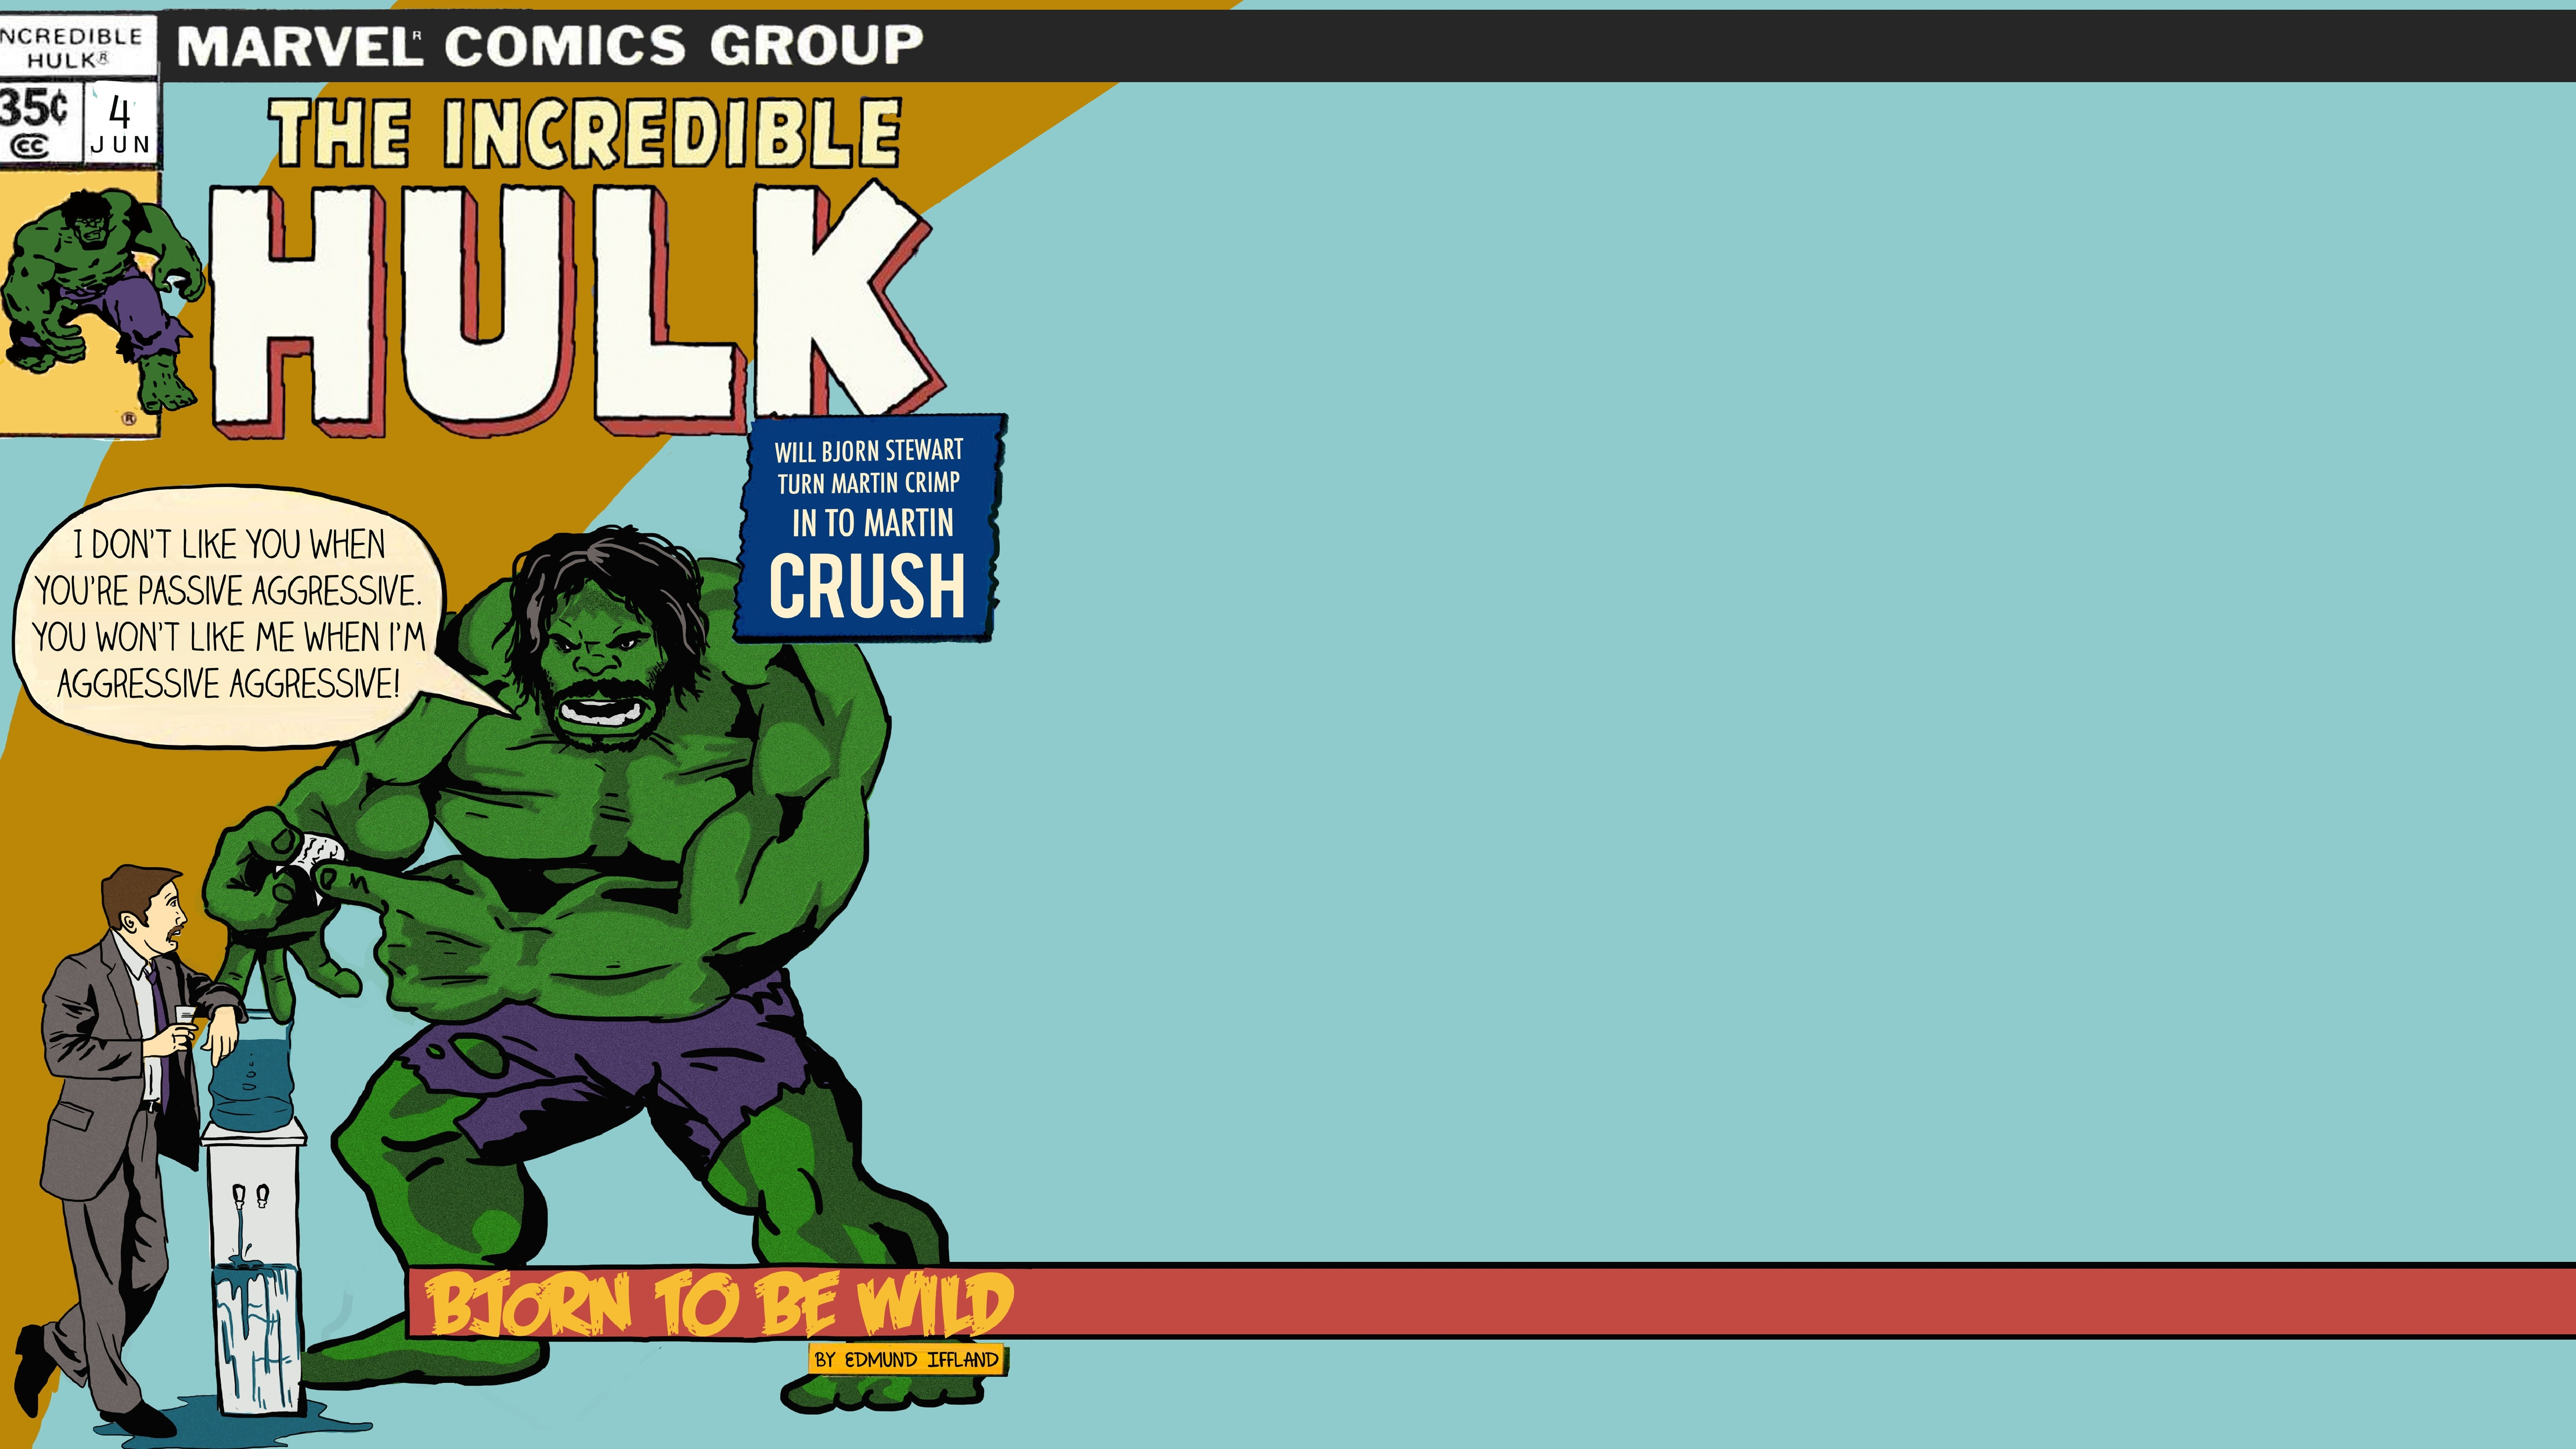 the incredible hulk 5k retina ultra hd wallpaper and